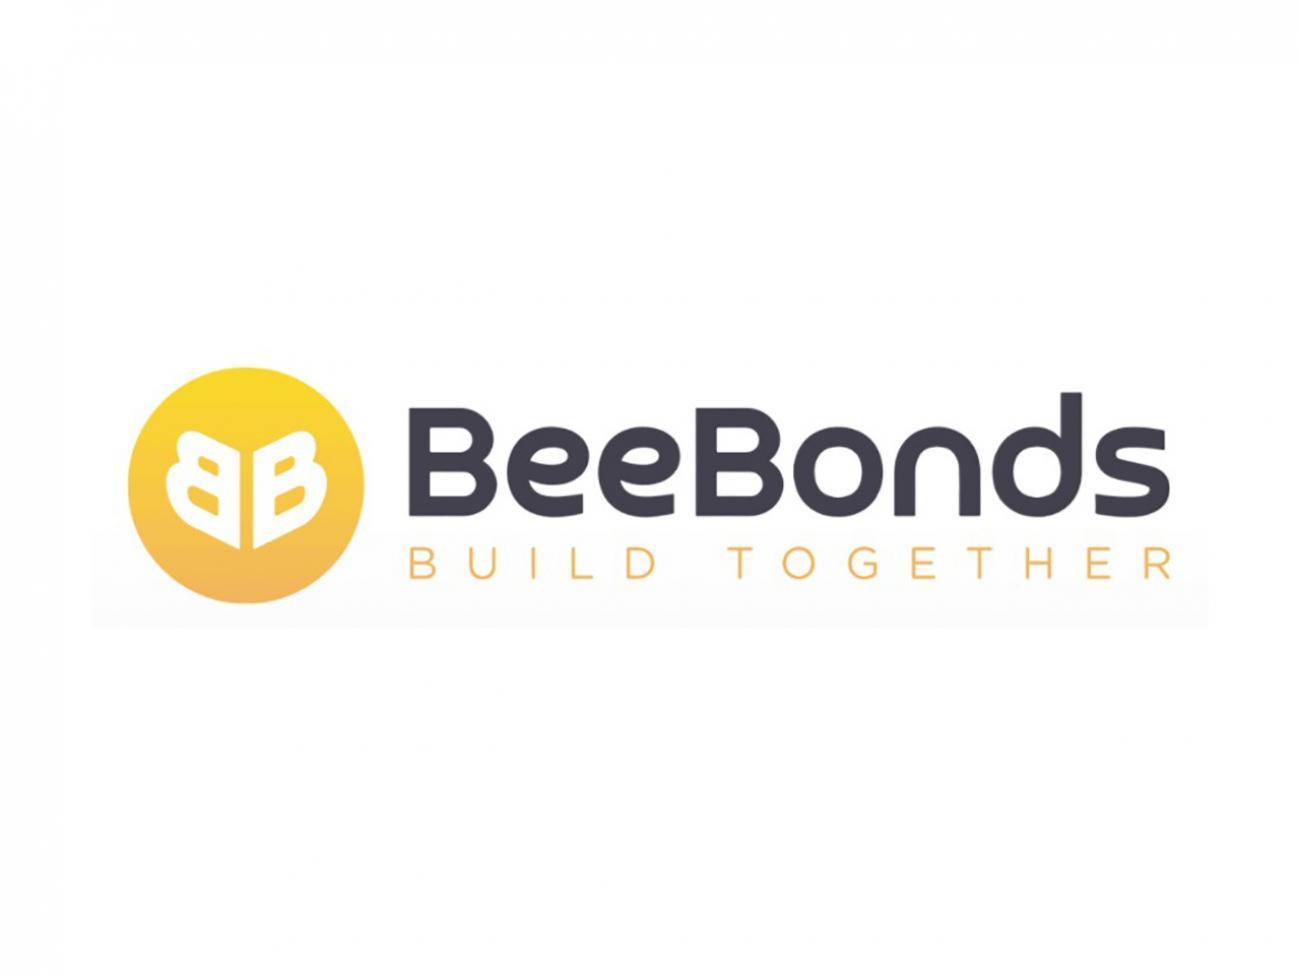 Beebonds1 logo